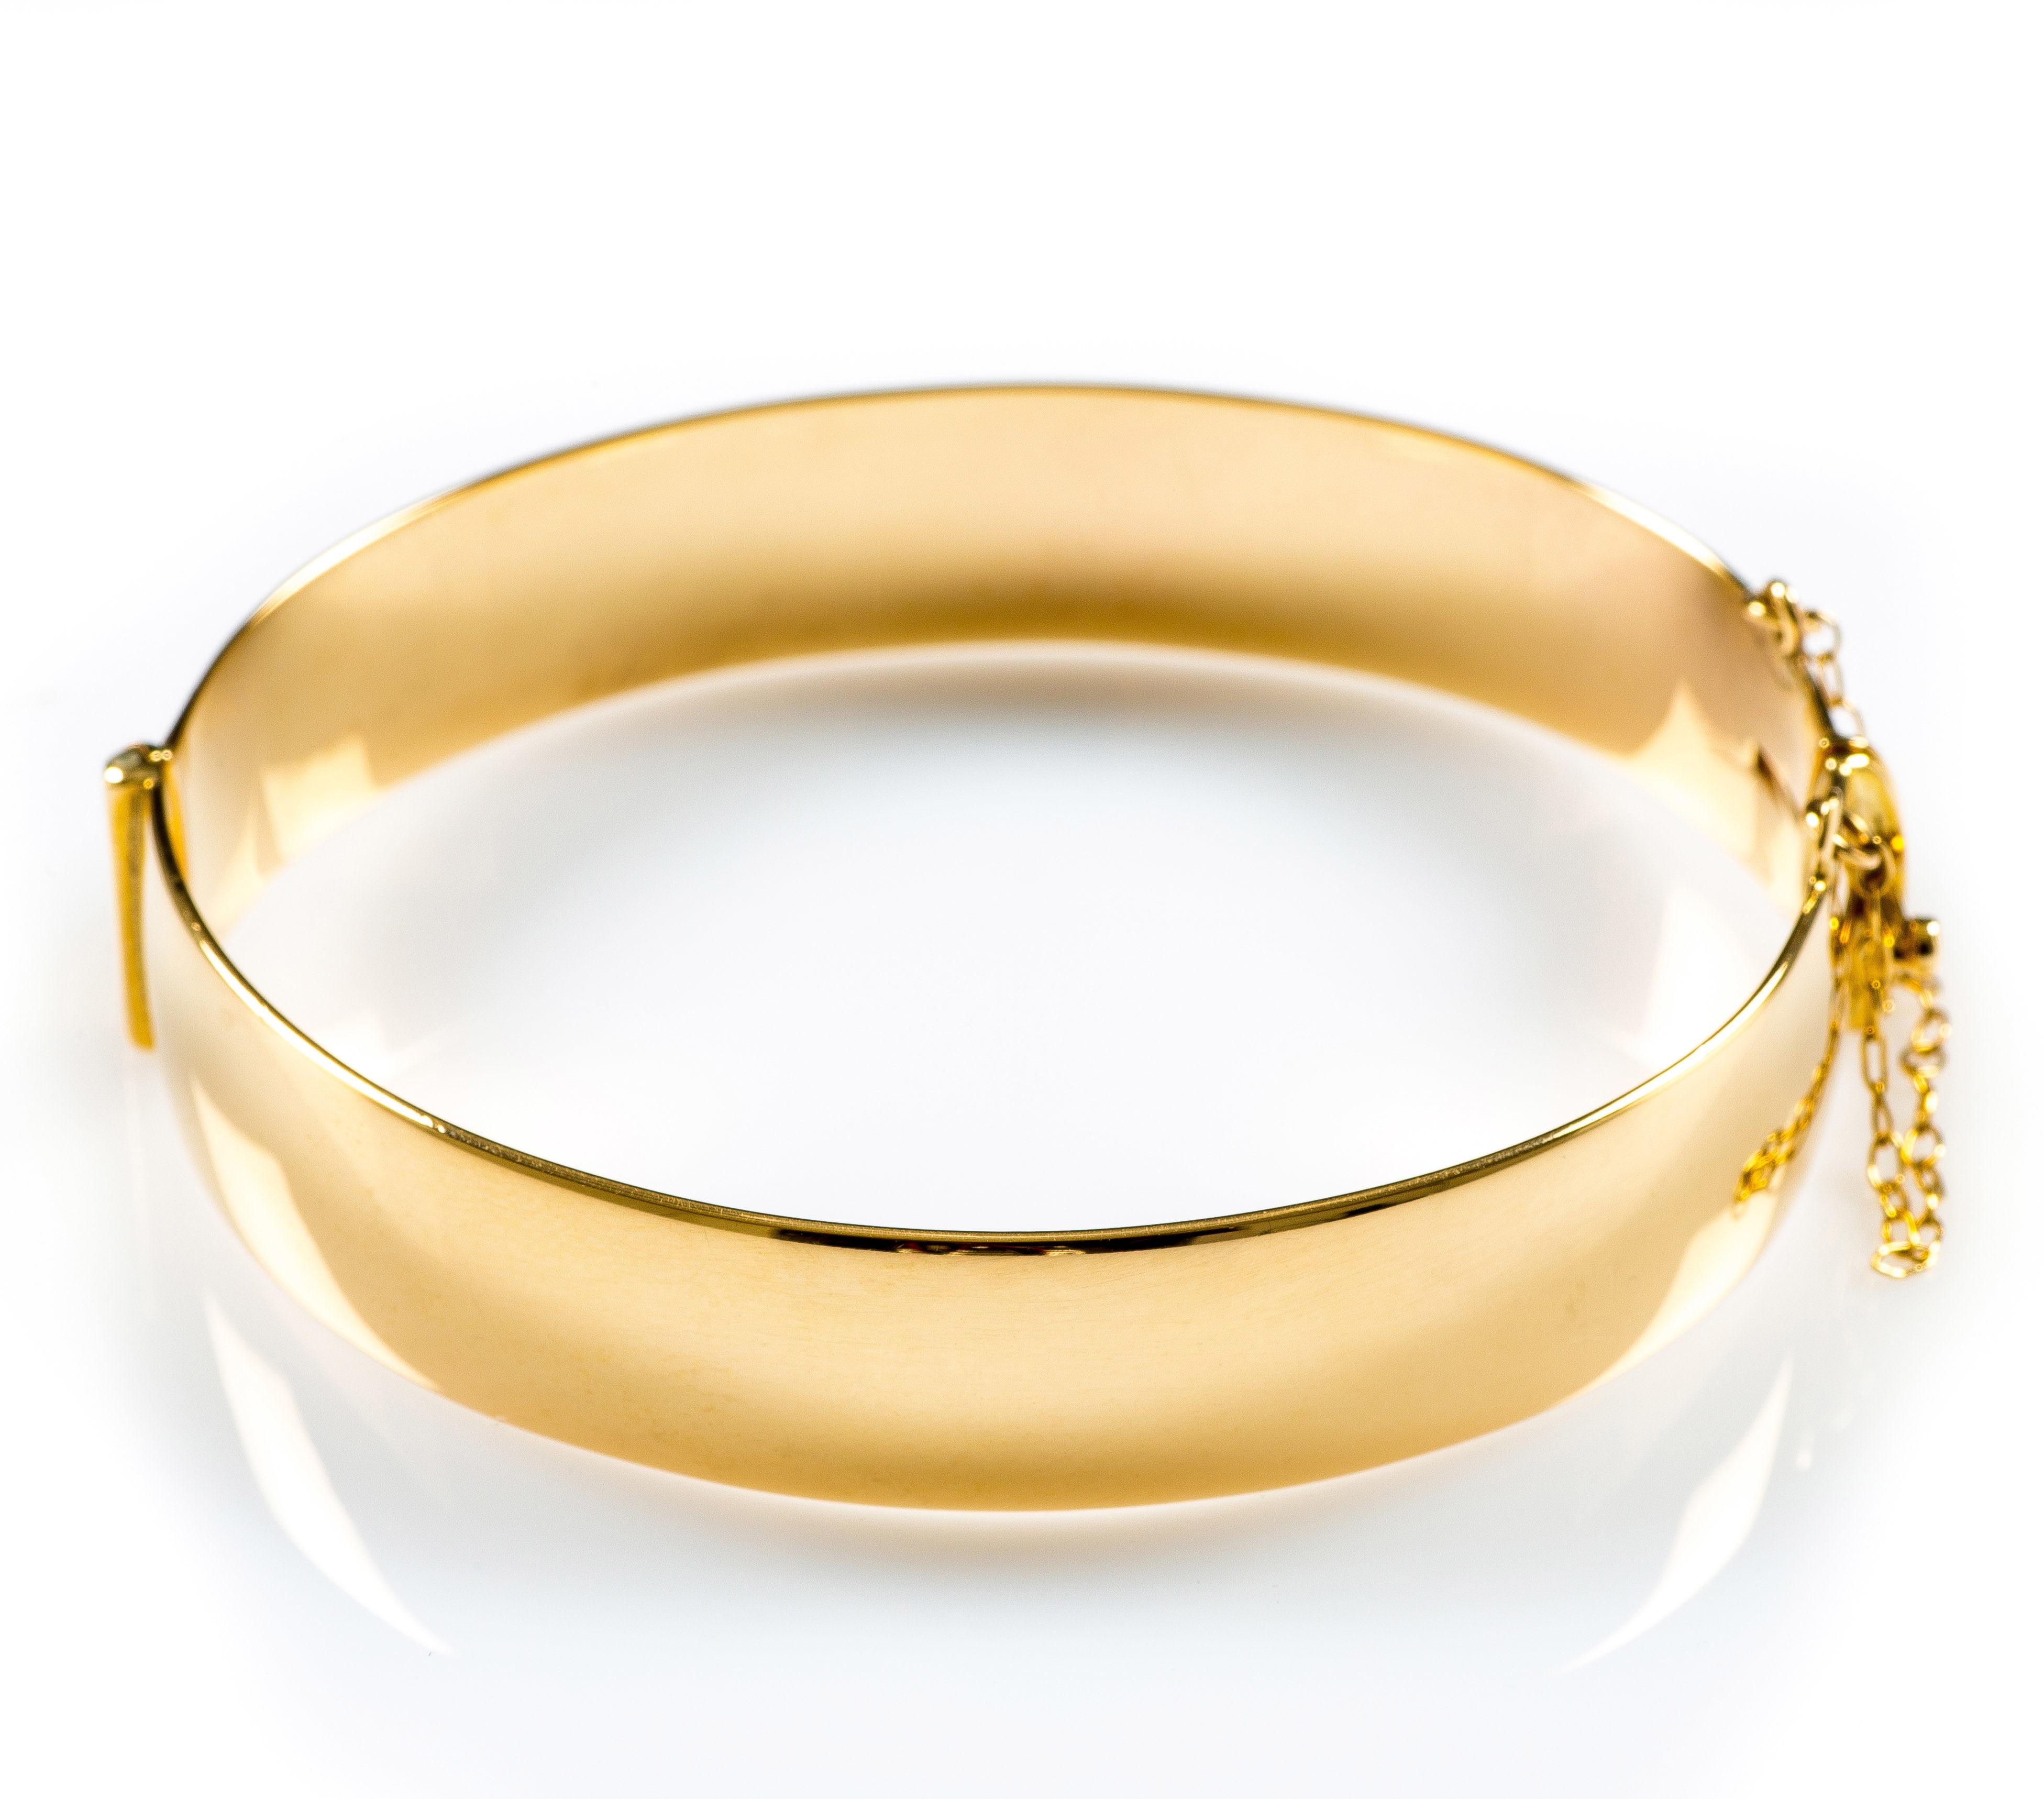 62dca14f3b65f 9CT YELLOW GOLD HINGED BANGLE